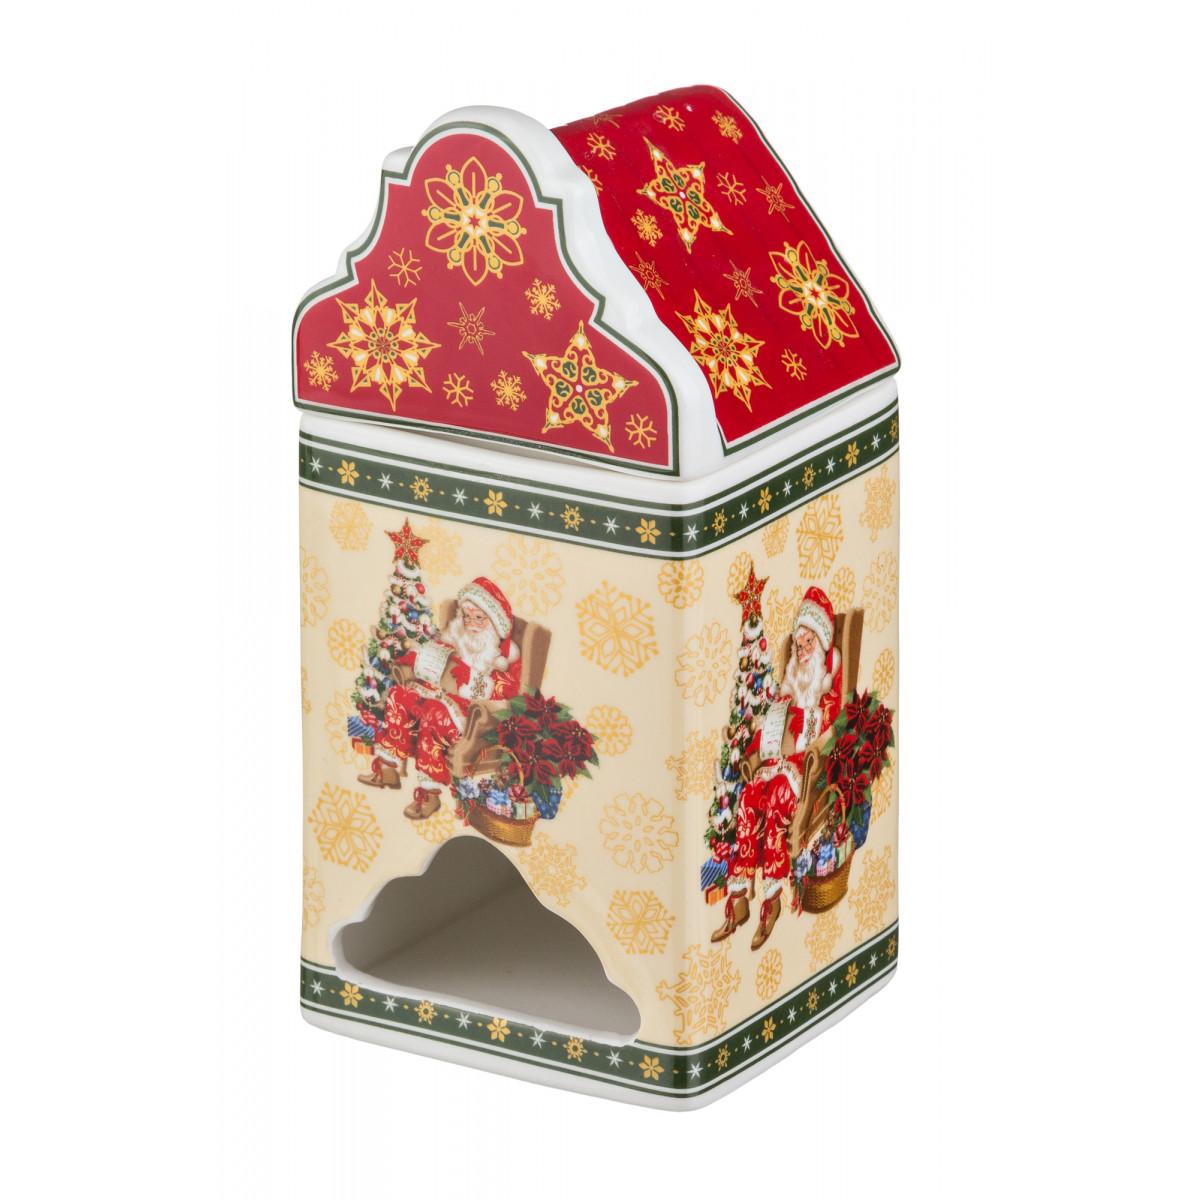 {} Lefard Подставка для кухни Damask  (9х9х18 см) подставка для предметов bedminster damask abd tr 1073292